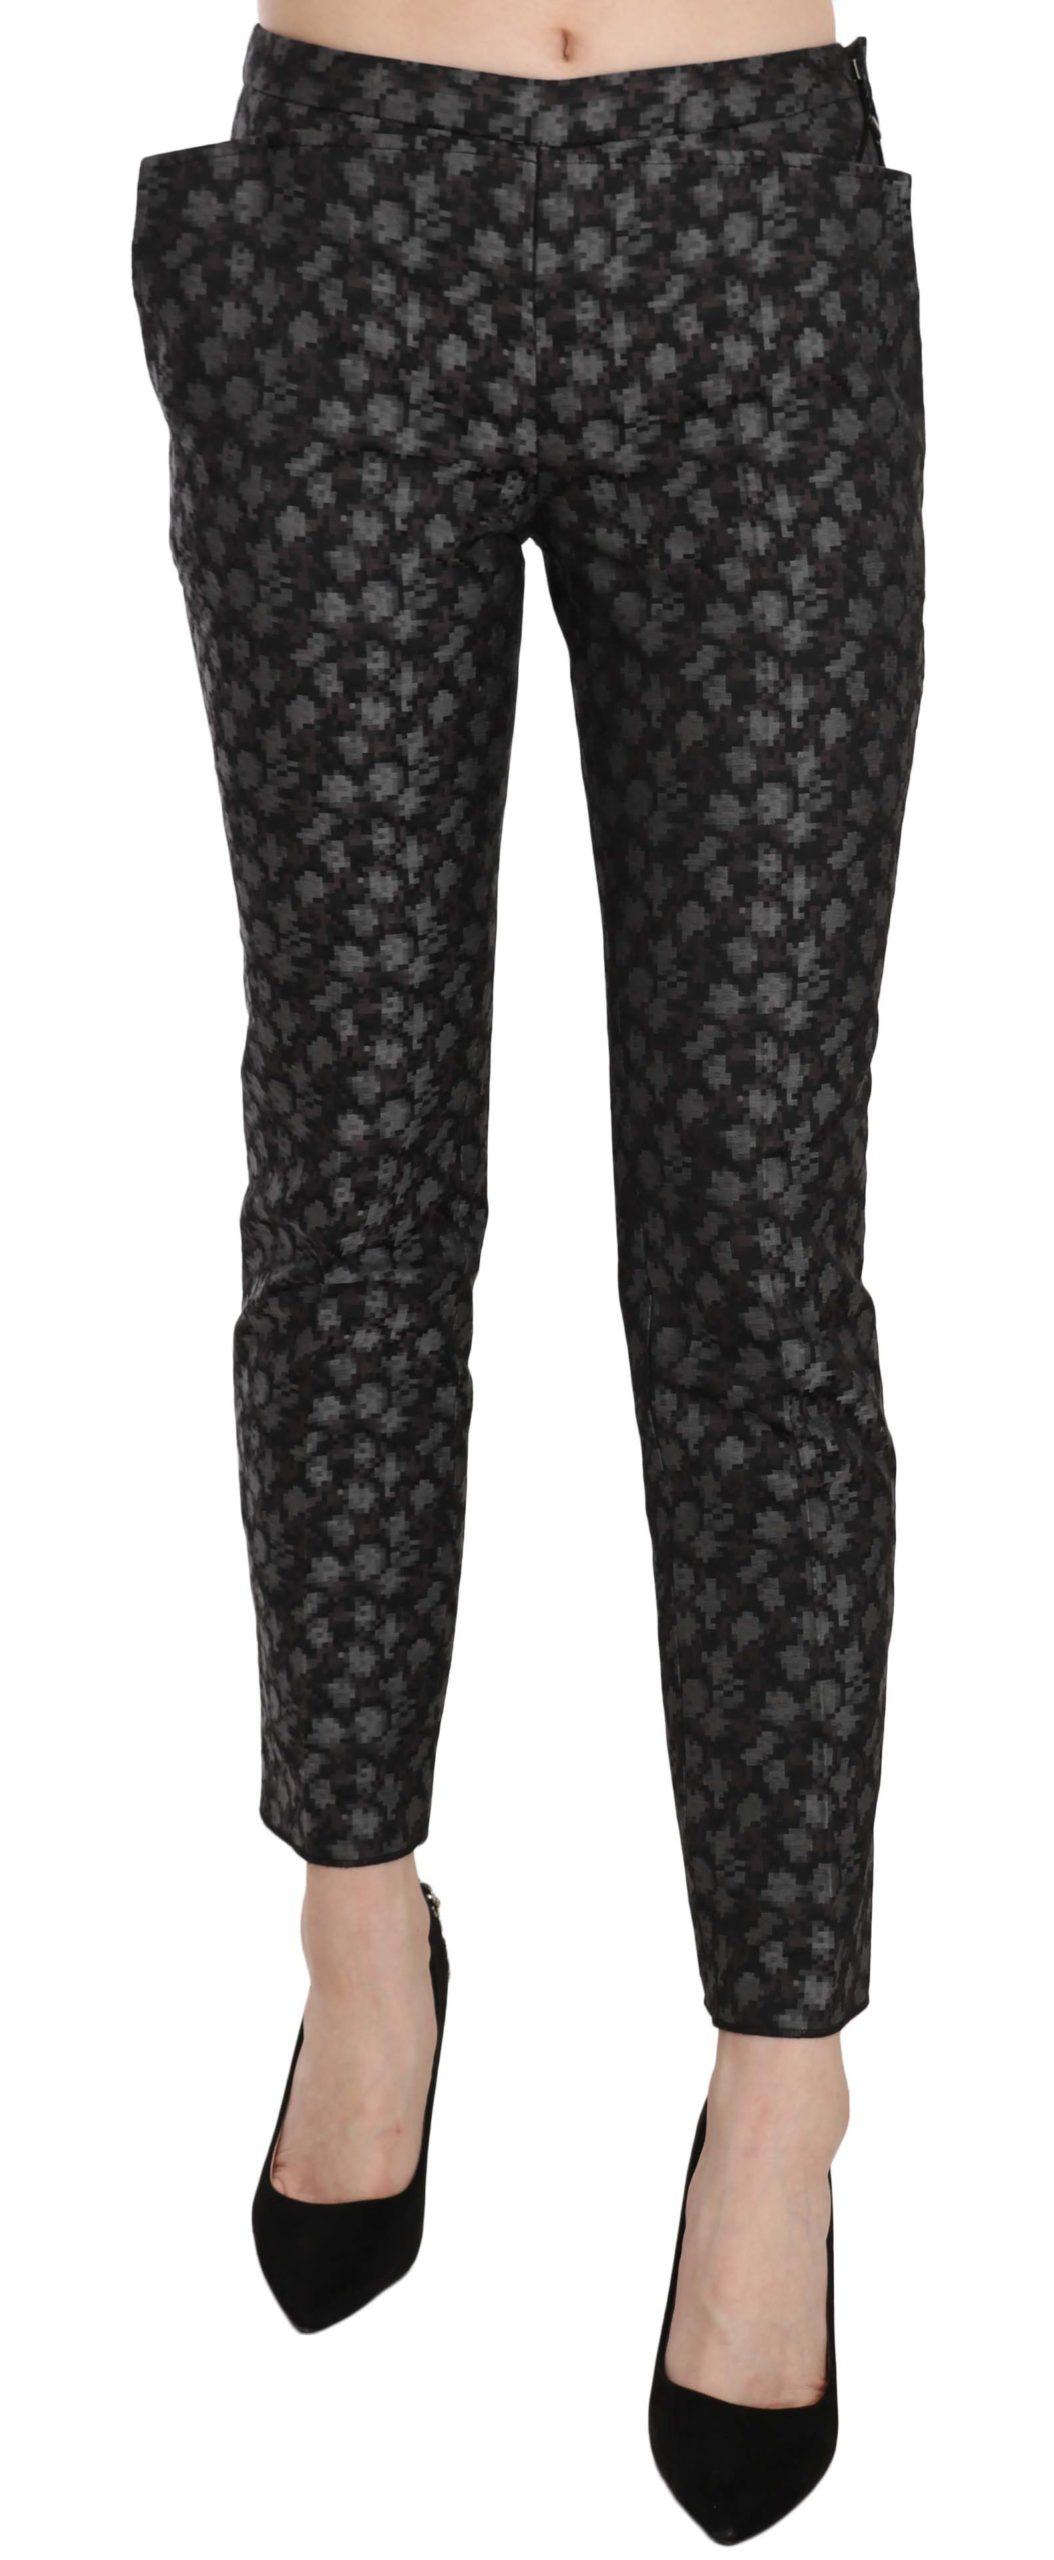 Just Cavalli Women's Low Waist Skinny Trouser Black PAN70336 - IT40|S